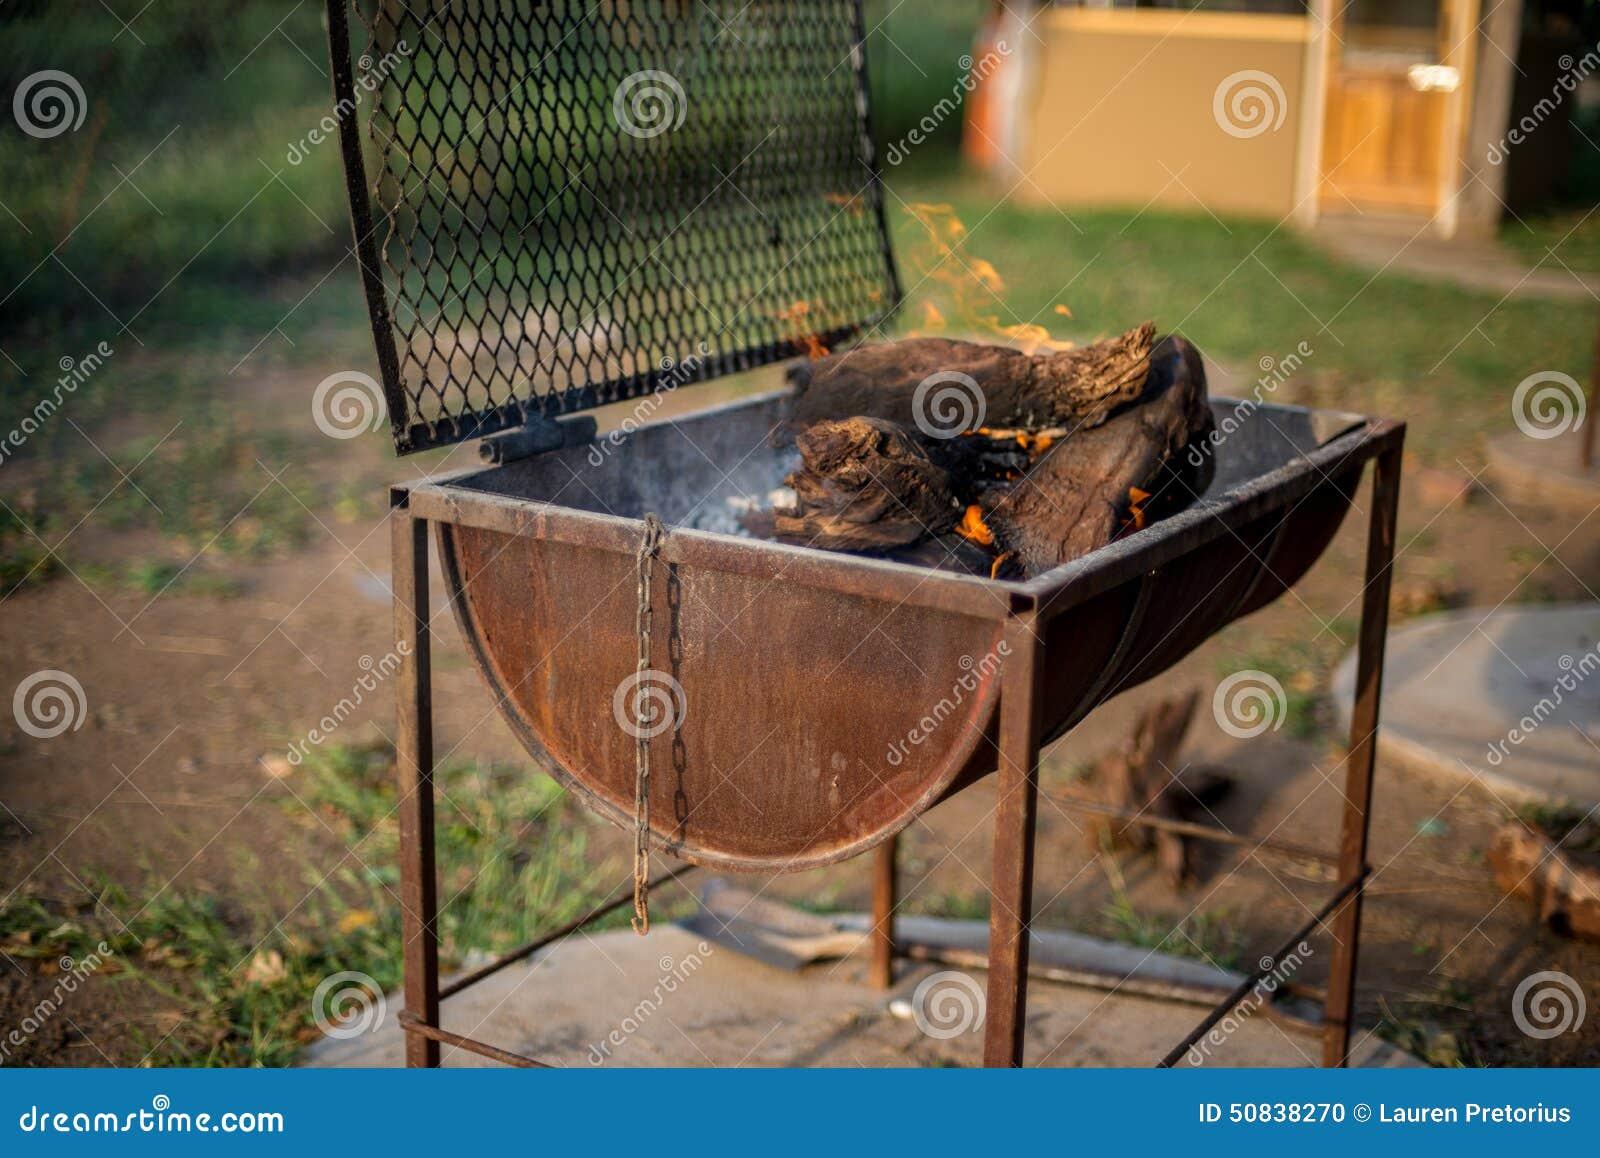 fass grill stockfoto bild 50838270. Black Bedroom Furniture Sets. Home Design Ideas